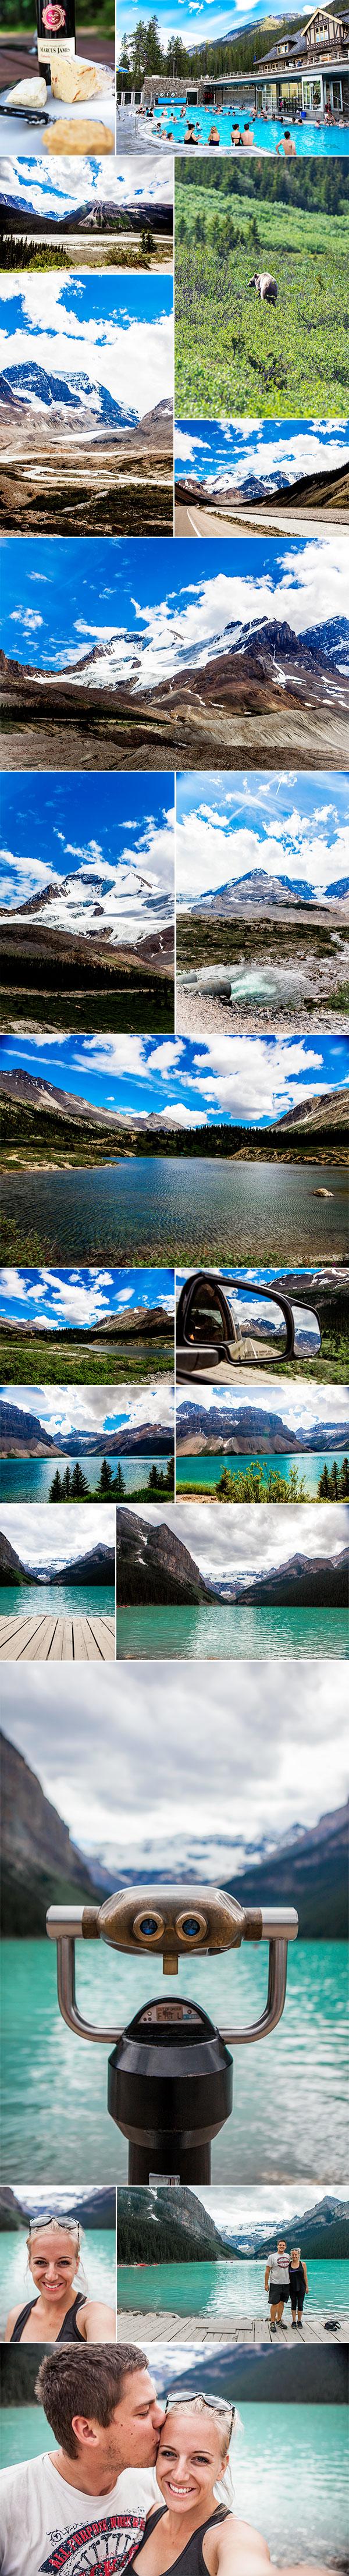 Banff-National-Park-